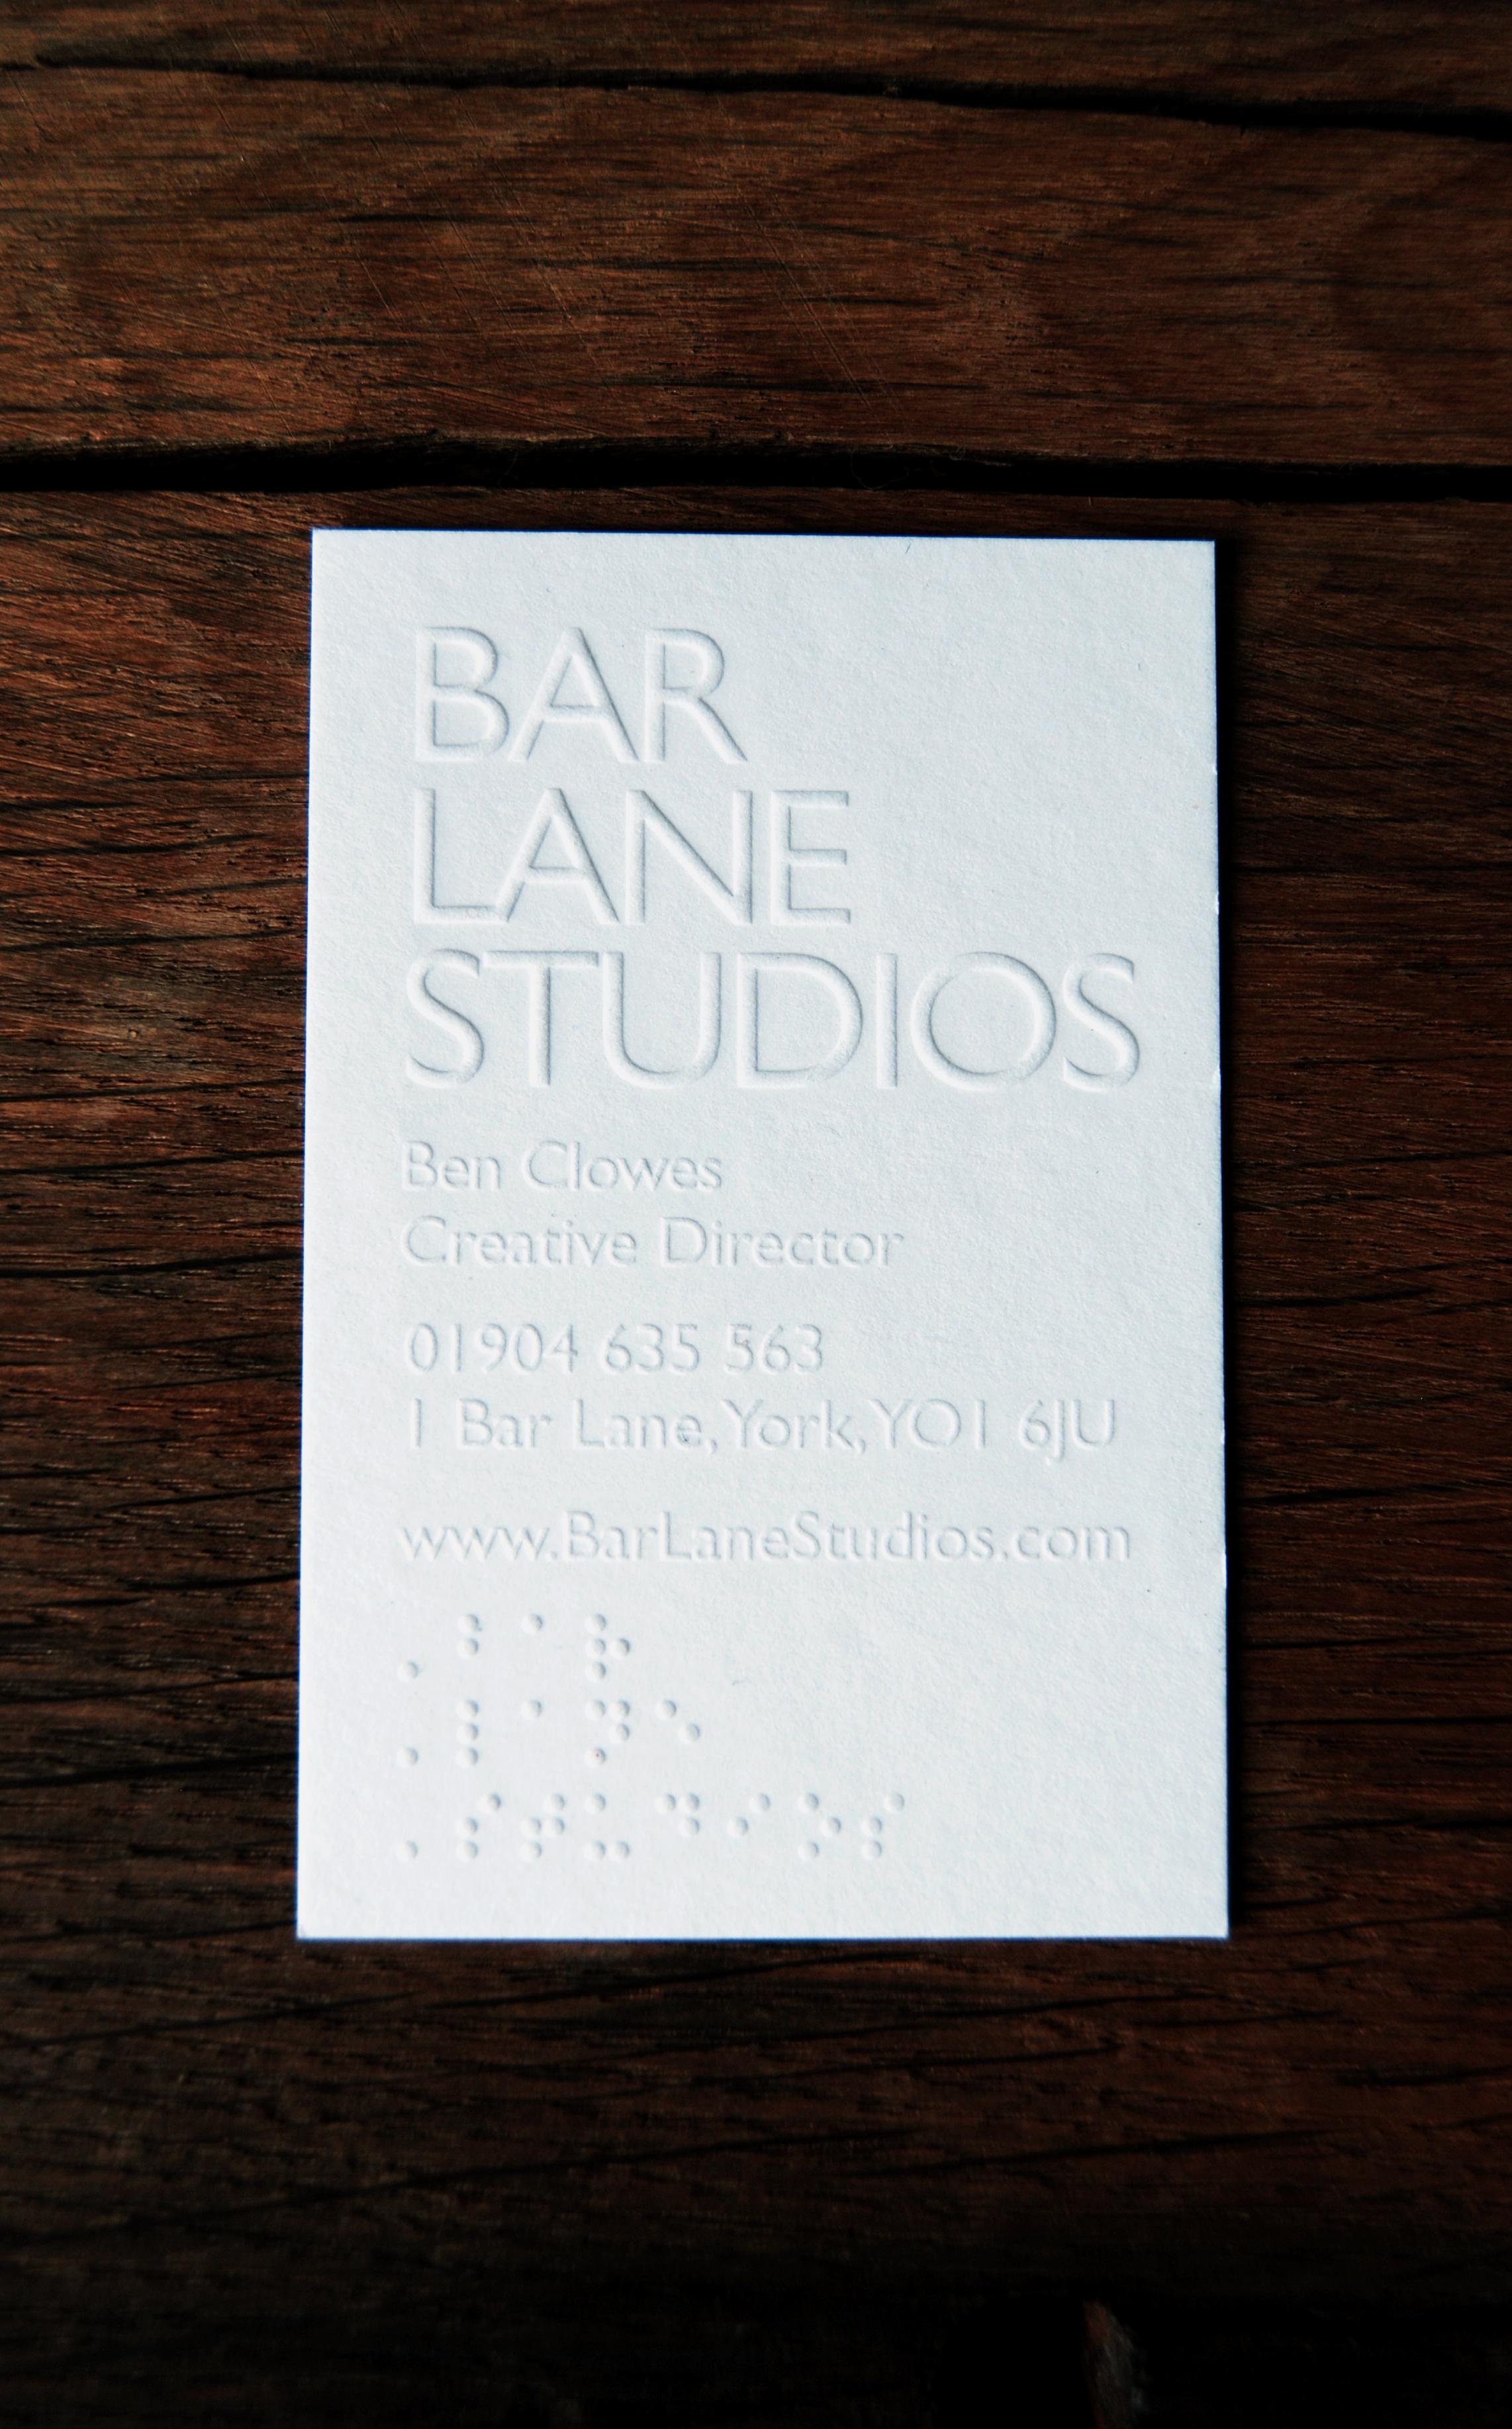 Business Card Design for Bar Lane Studios - Jamie Hutchinson